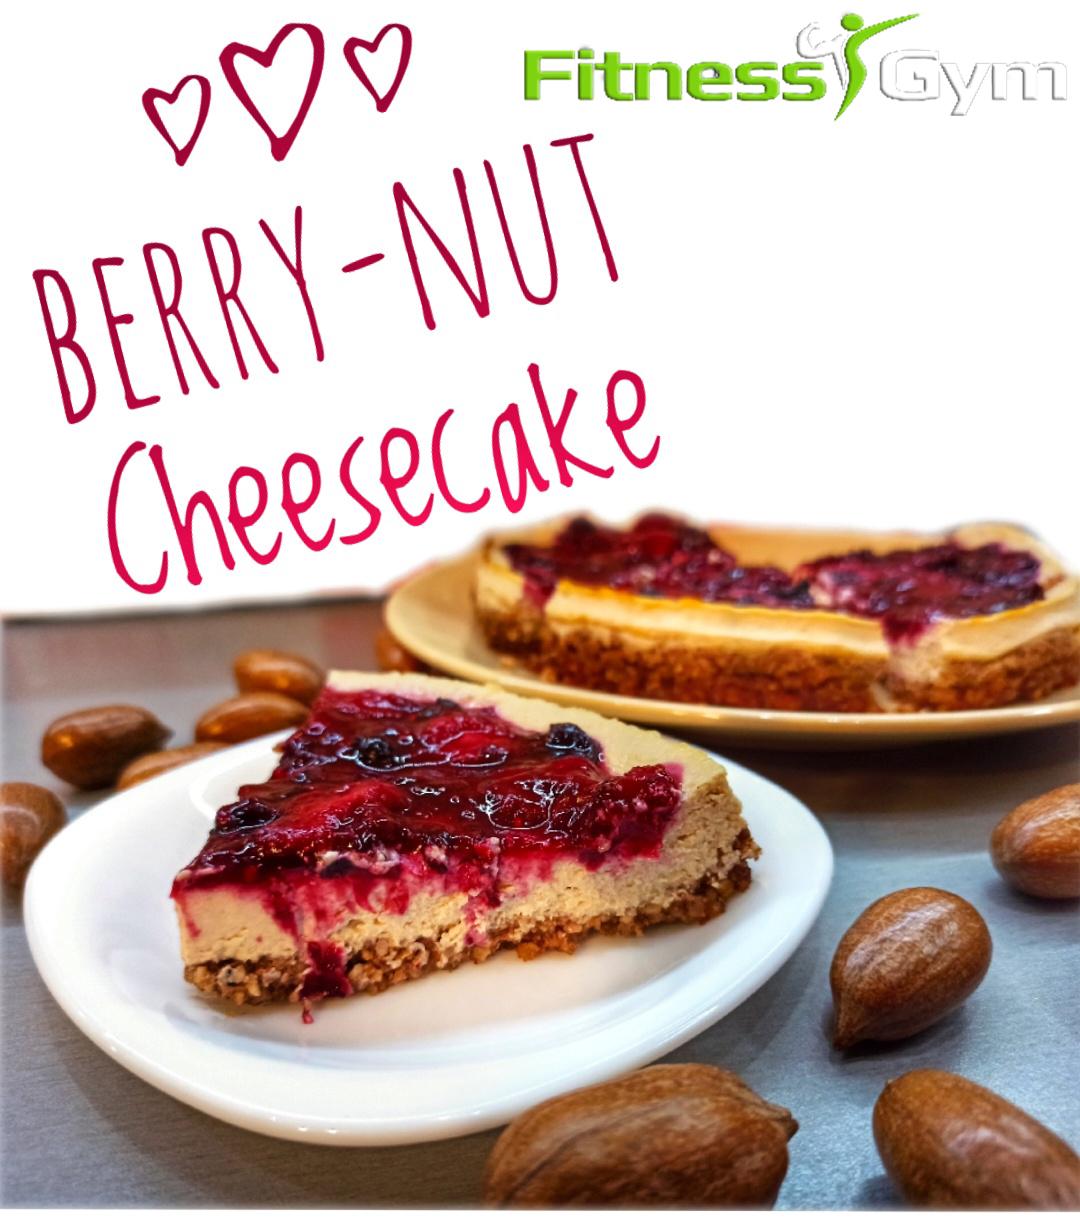 Berry-Nut Cheesecake